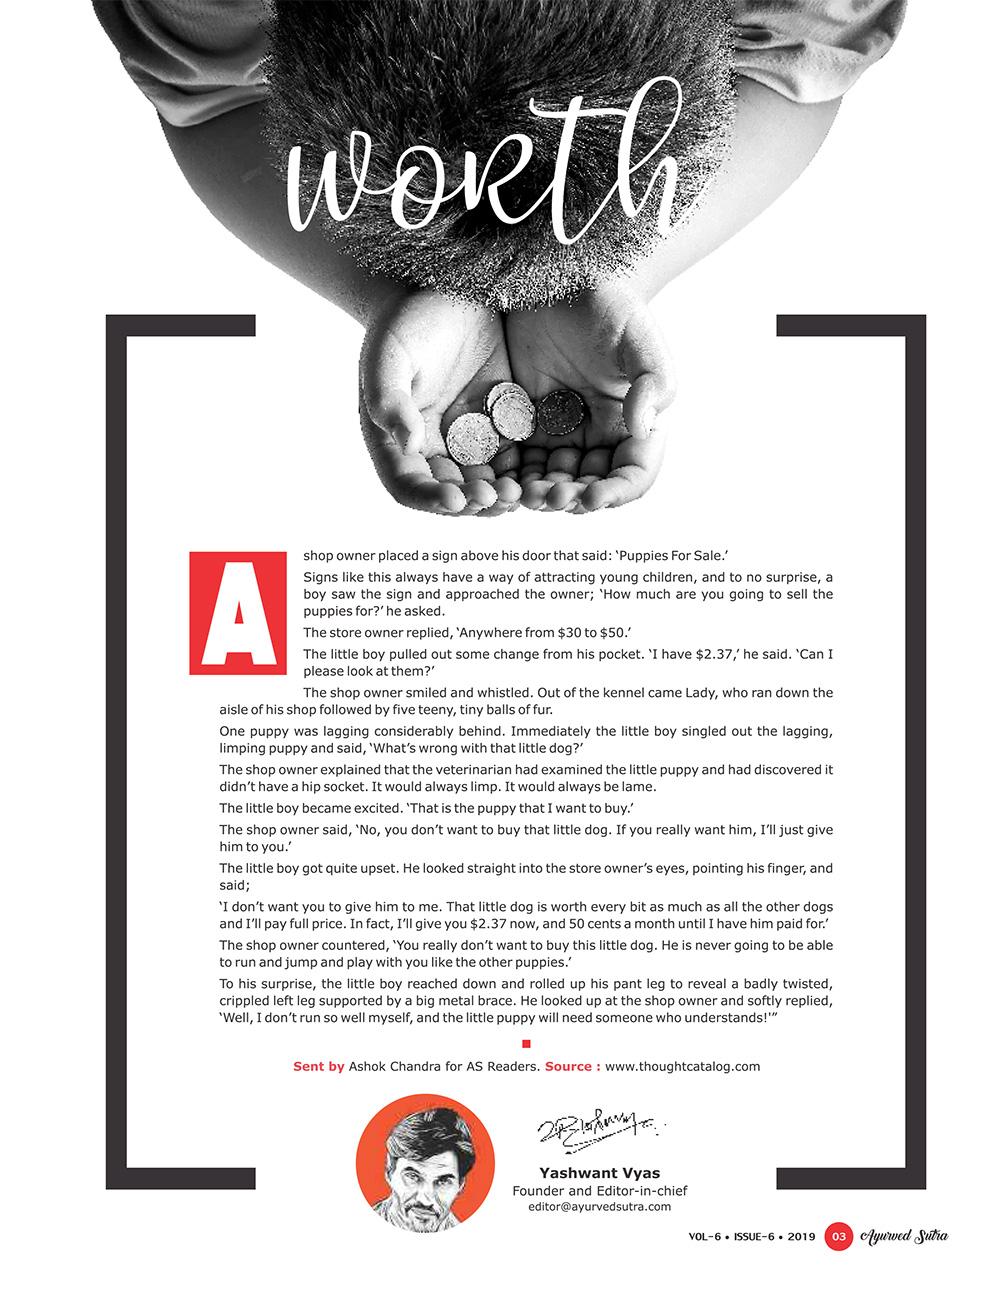 Ayurvedsutra Vol 06 issue 06 5 - Worth